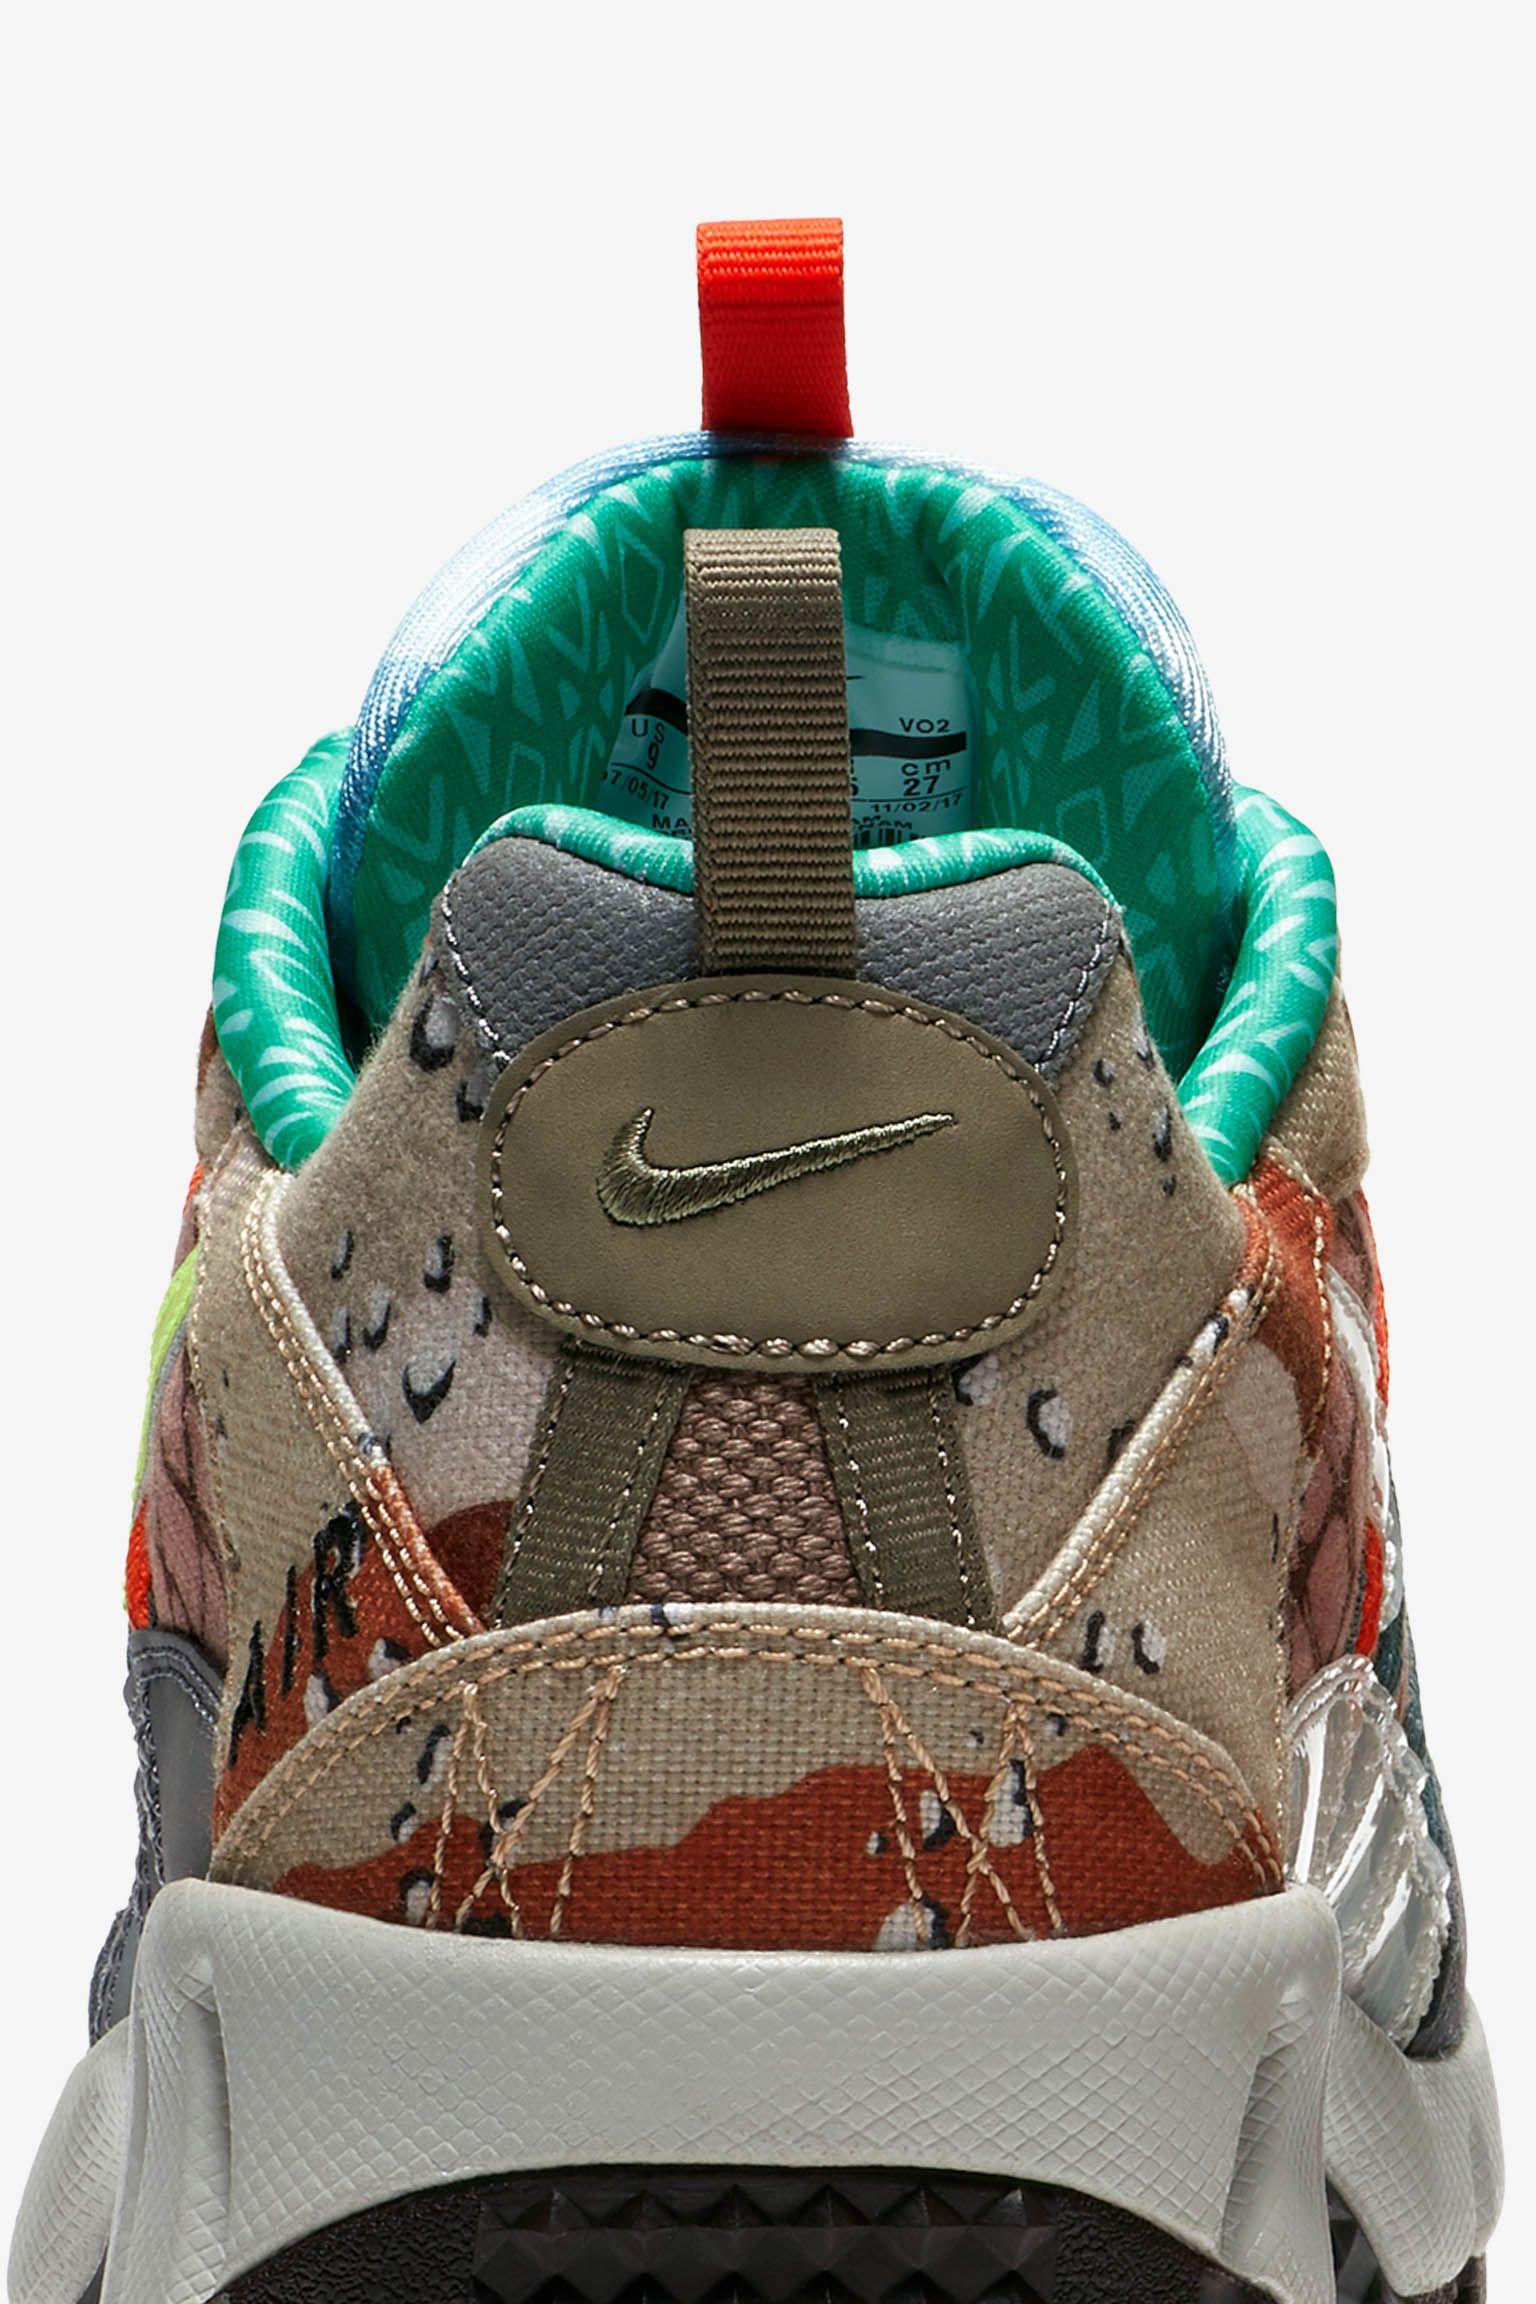 Nike Air Humara 'Steel Green & Volt Glow & Cool Grey' Release Date